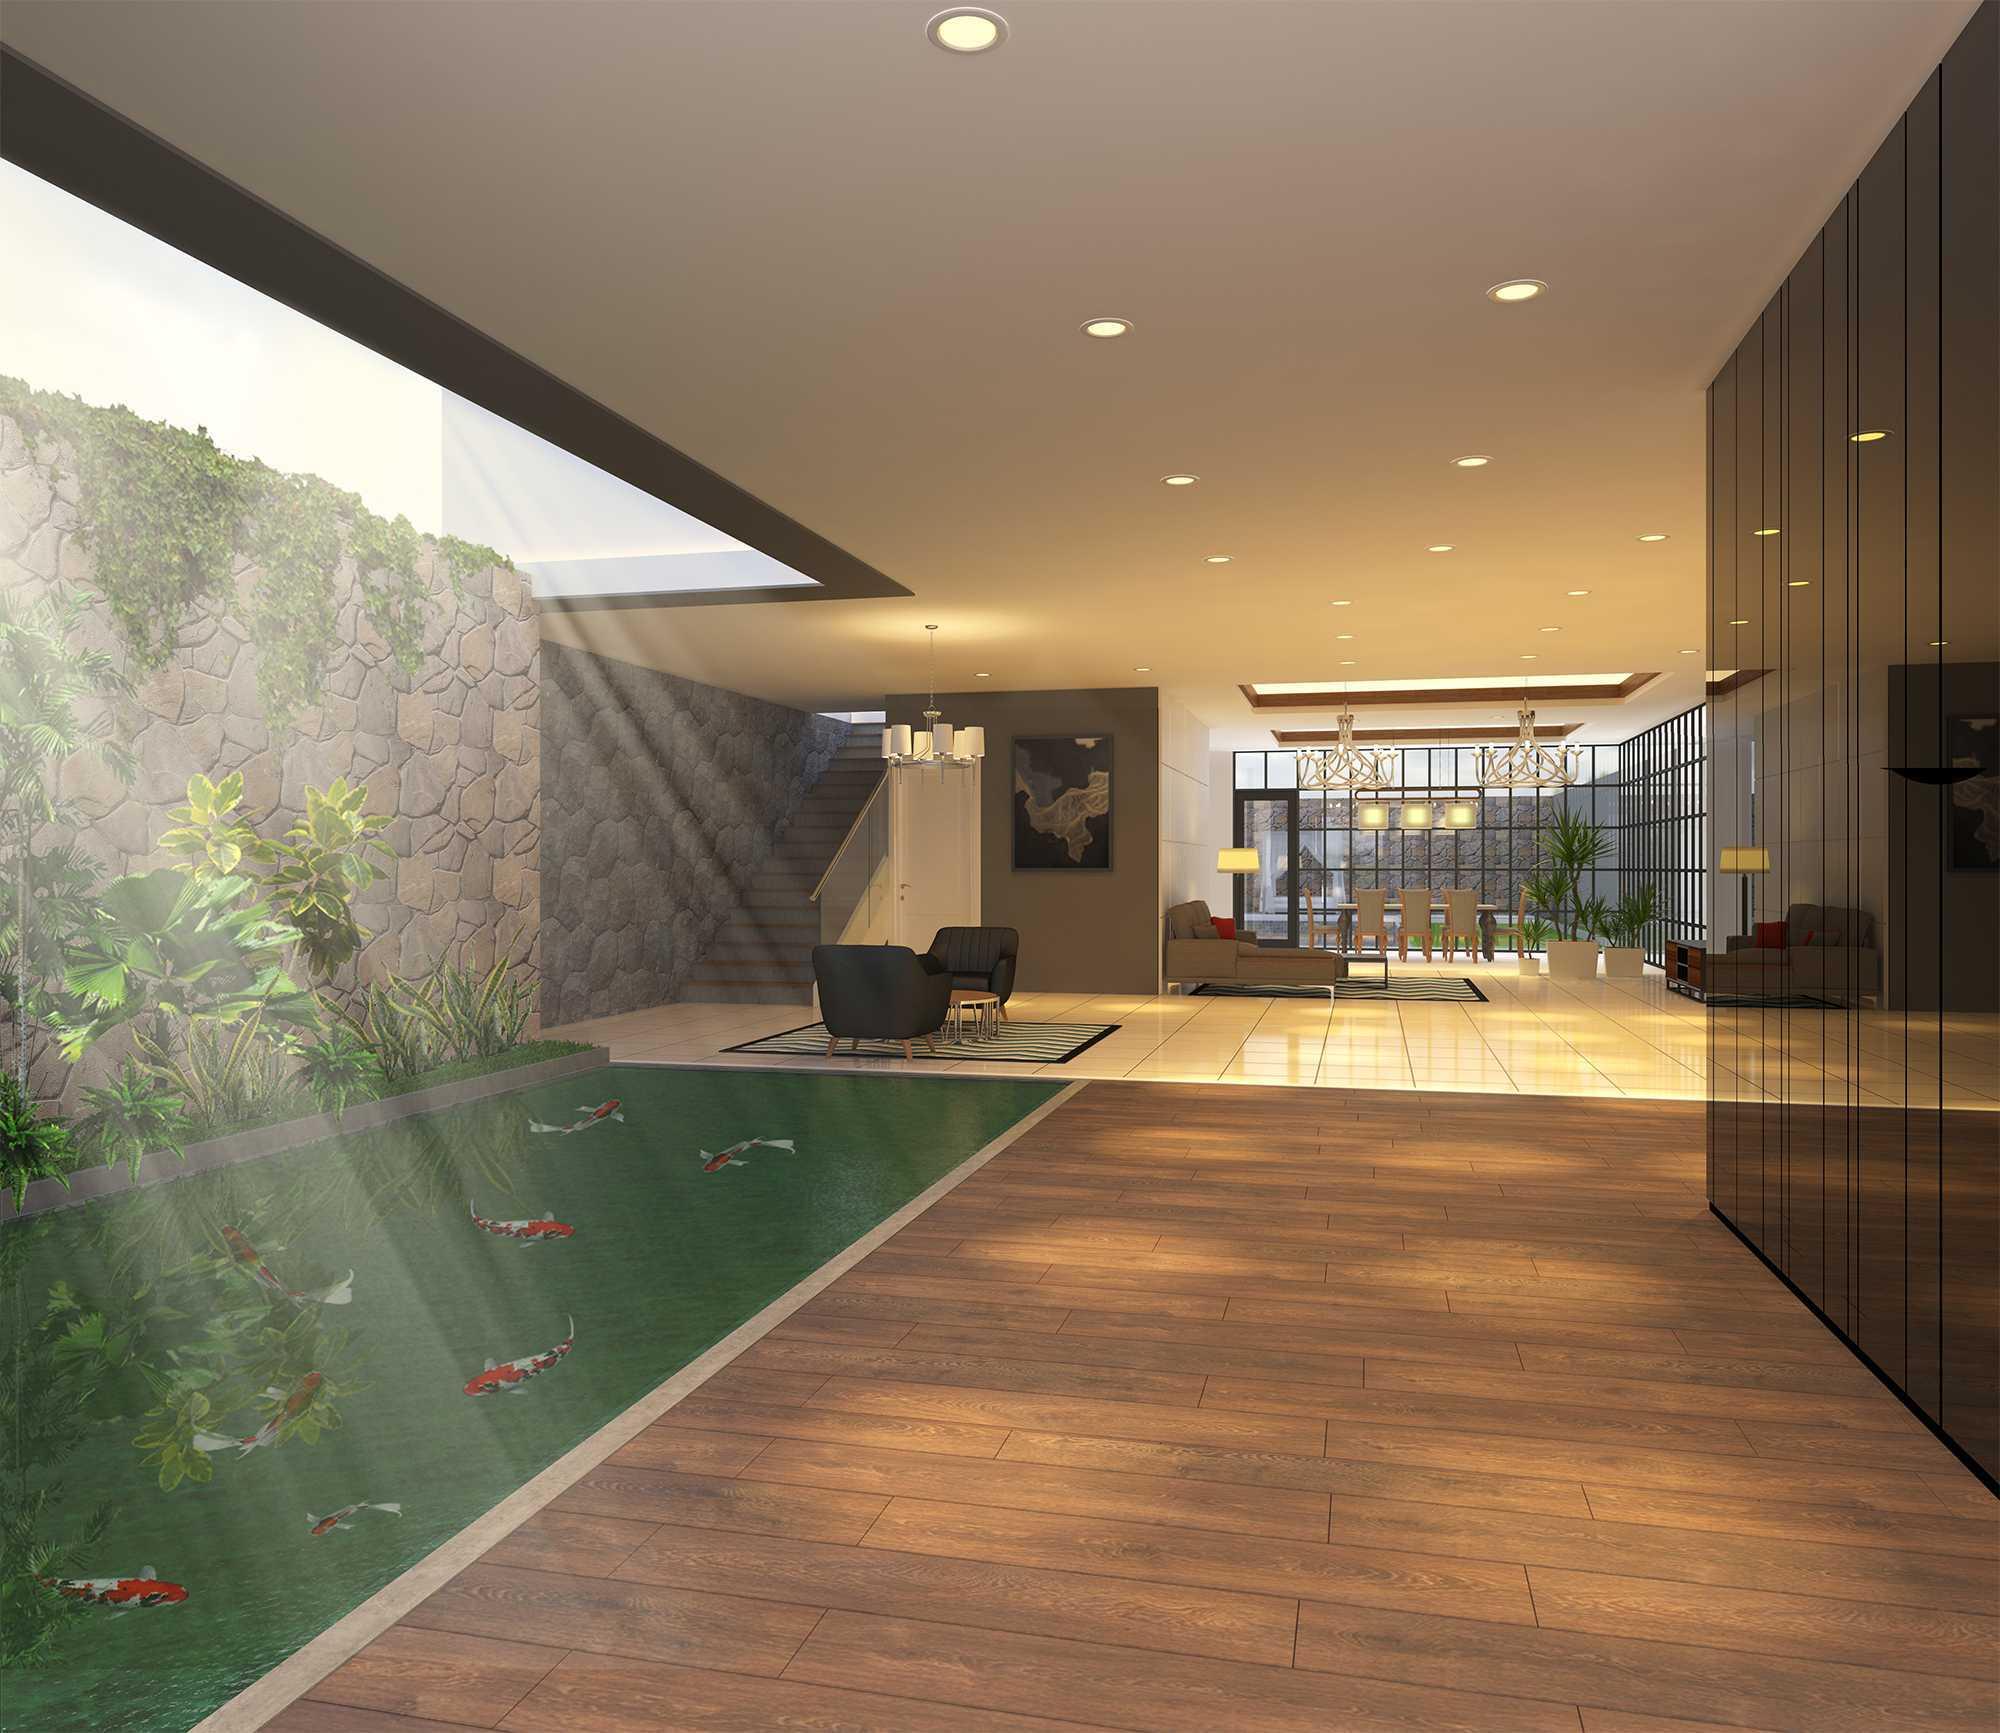 Sense Studio Villa - Bpk Rudy Bali, Indonesia Bali, Indonesia Sense-Studio-Villa-Bpk-Rudy Kontemporer  51635